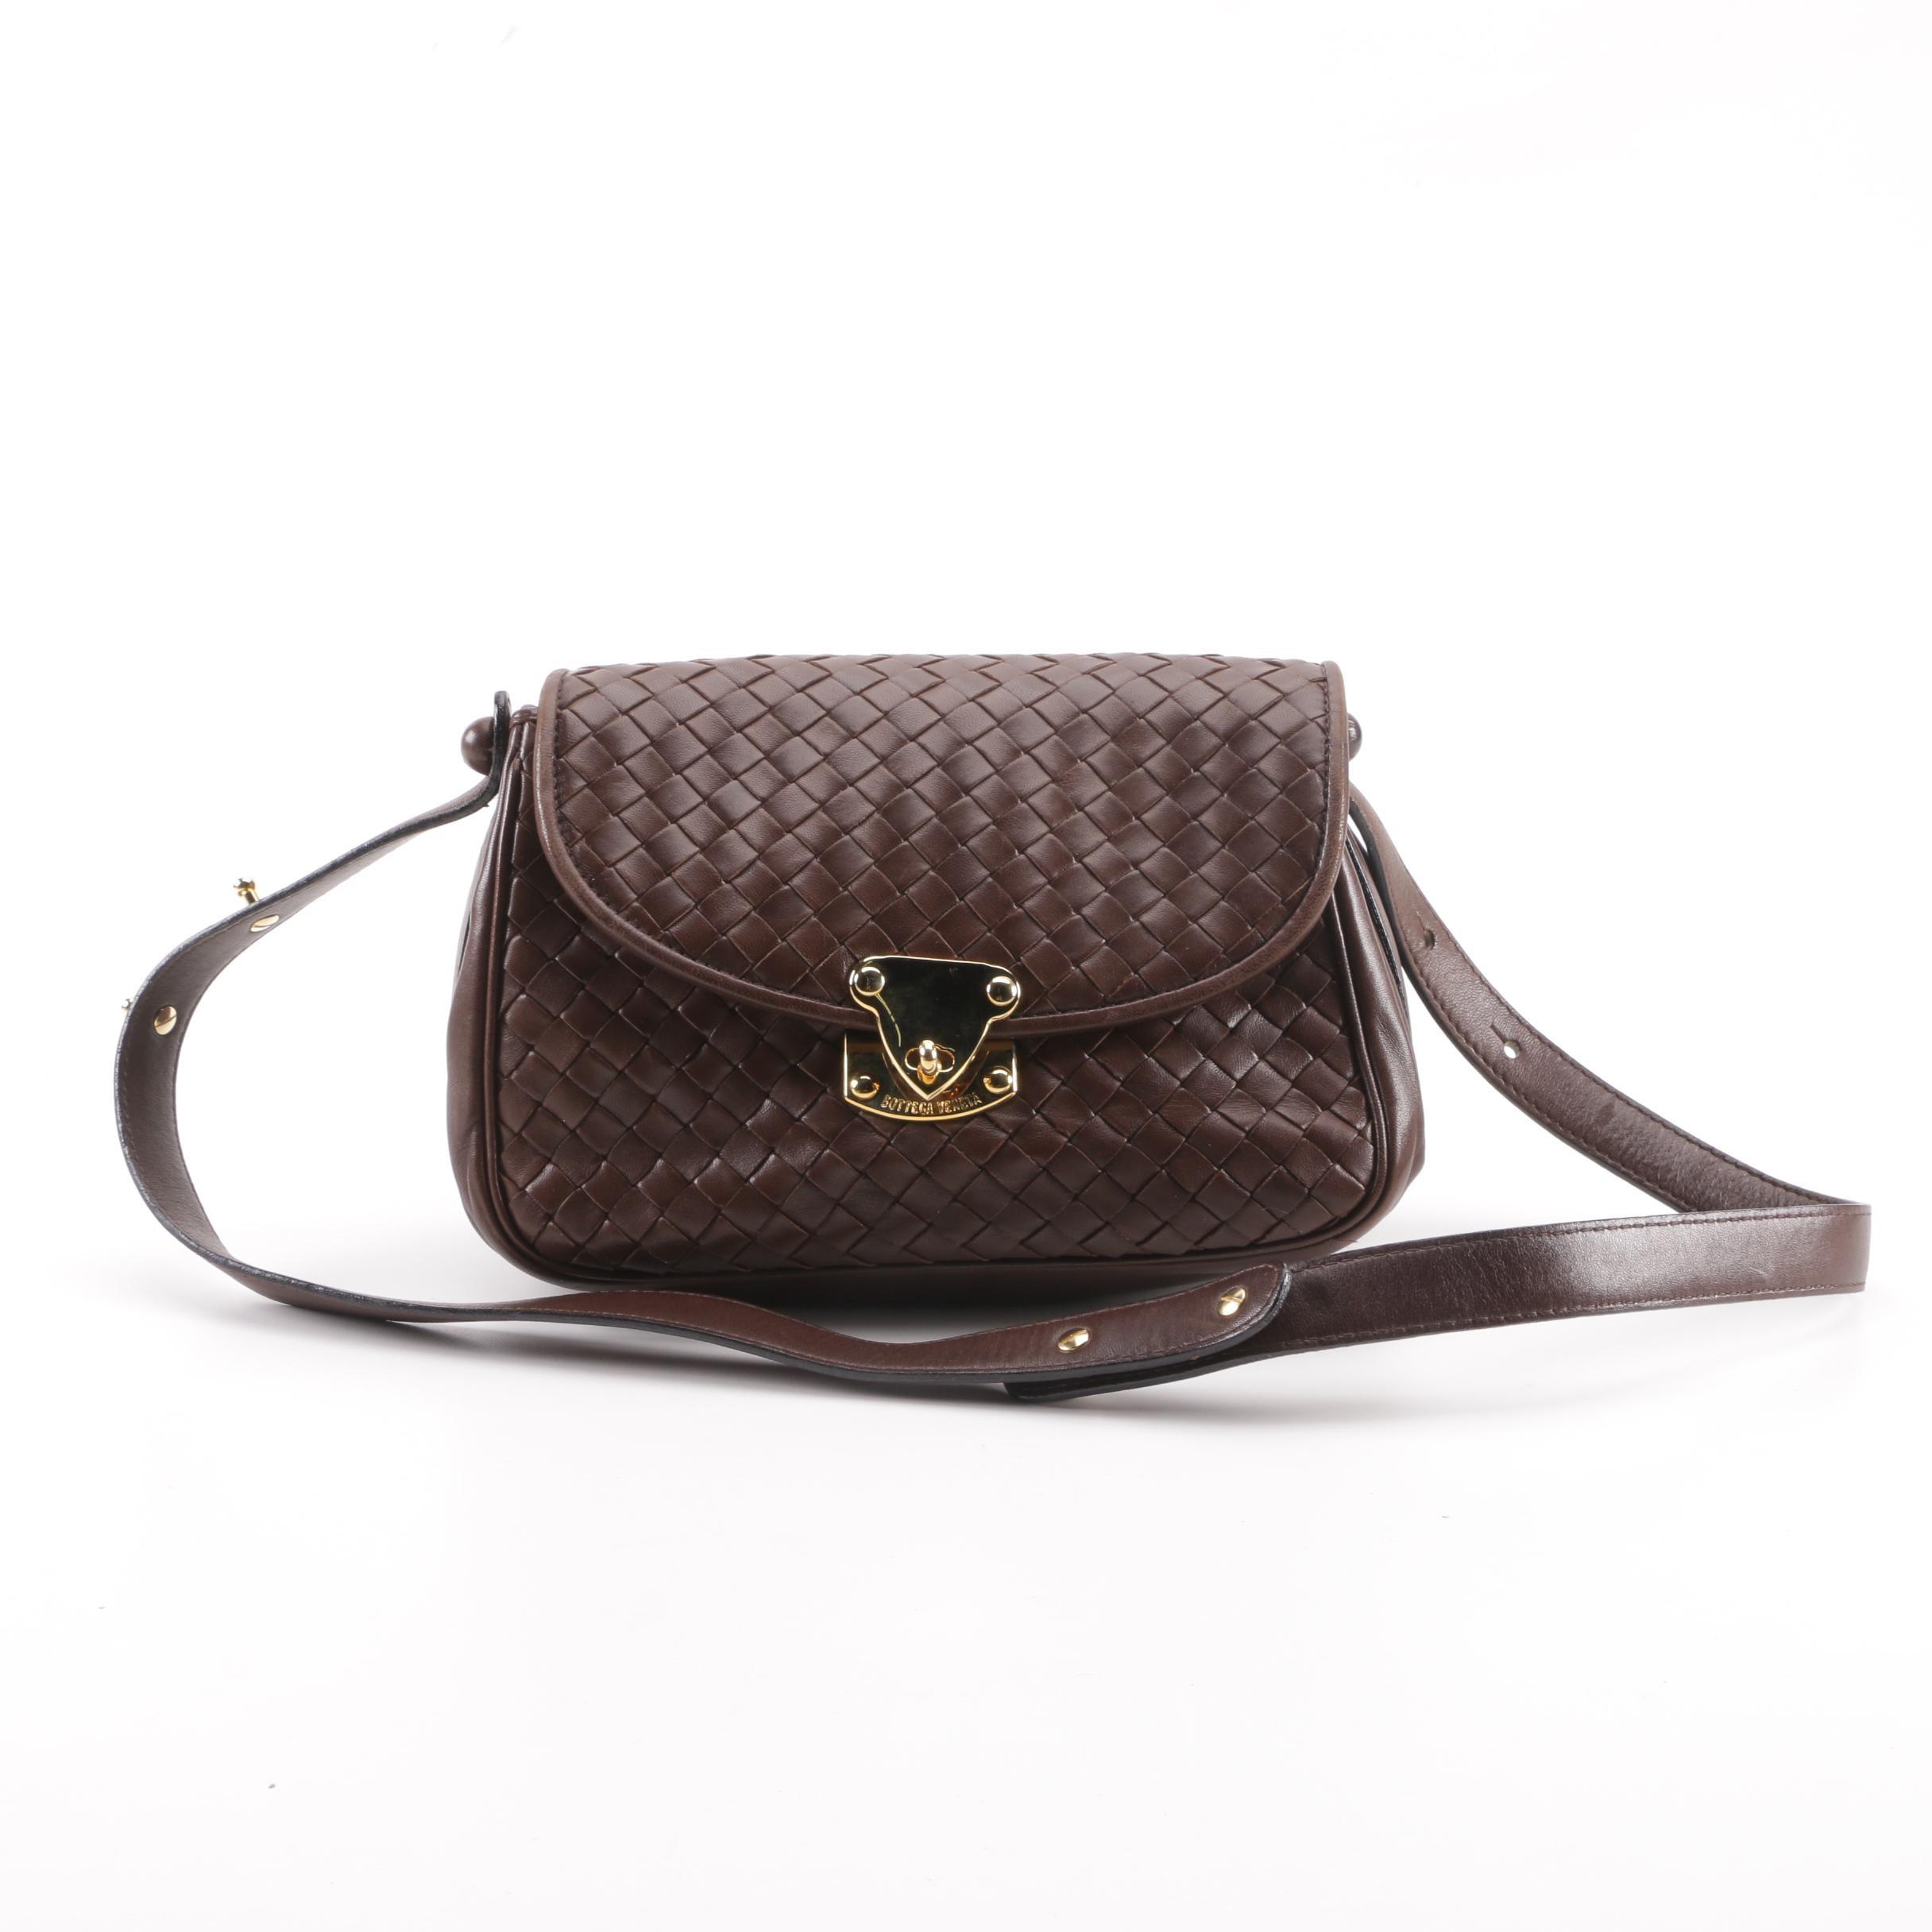 Bottega Veneta Intrecciato Brown Leather Shoulder Bag